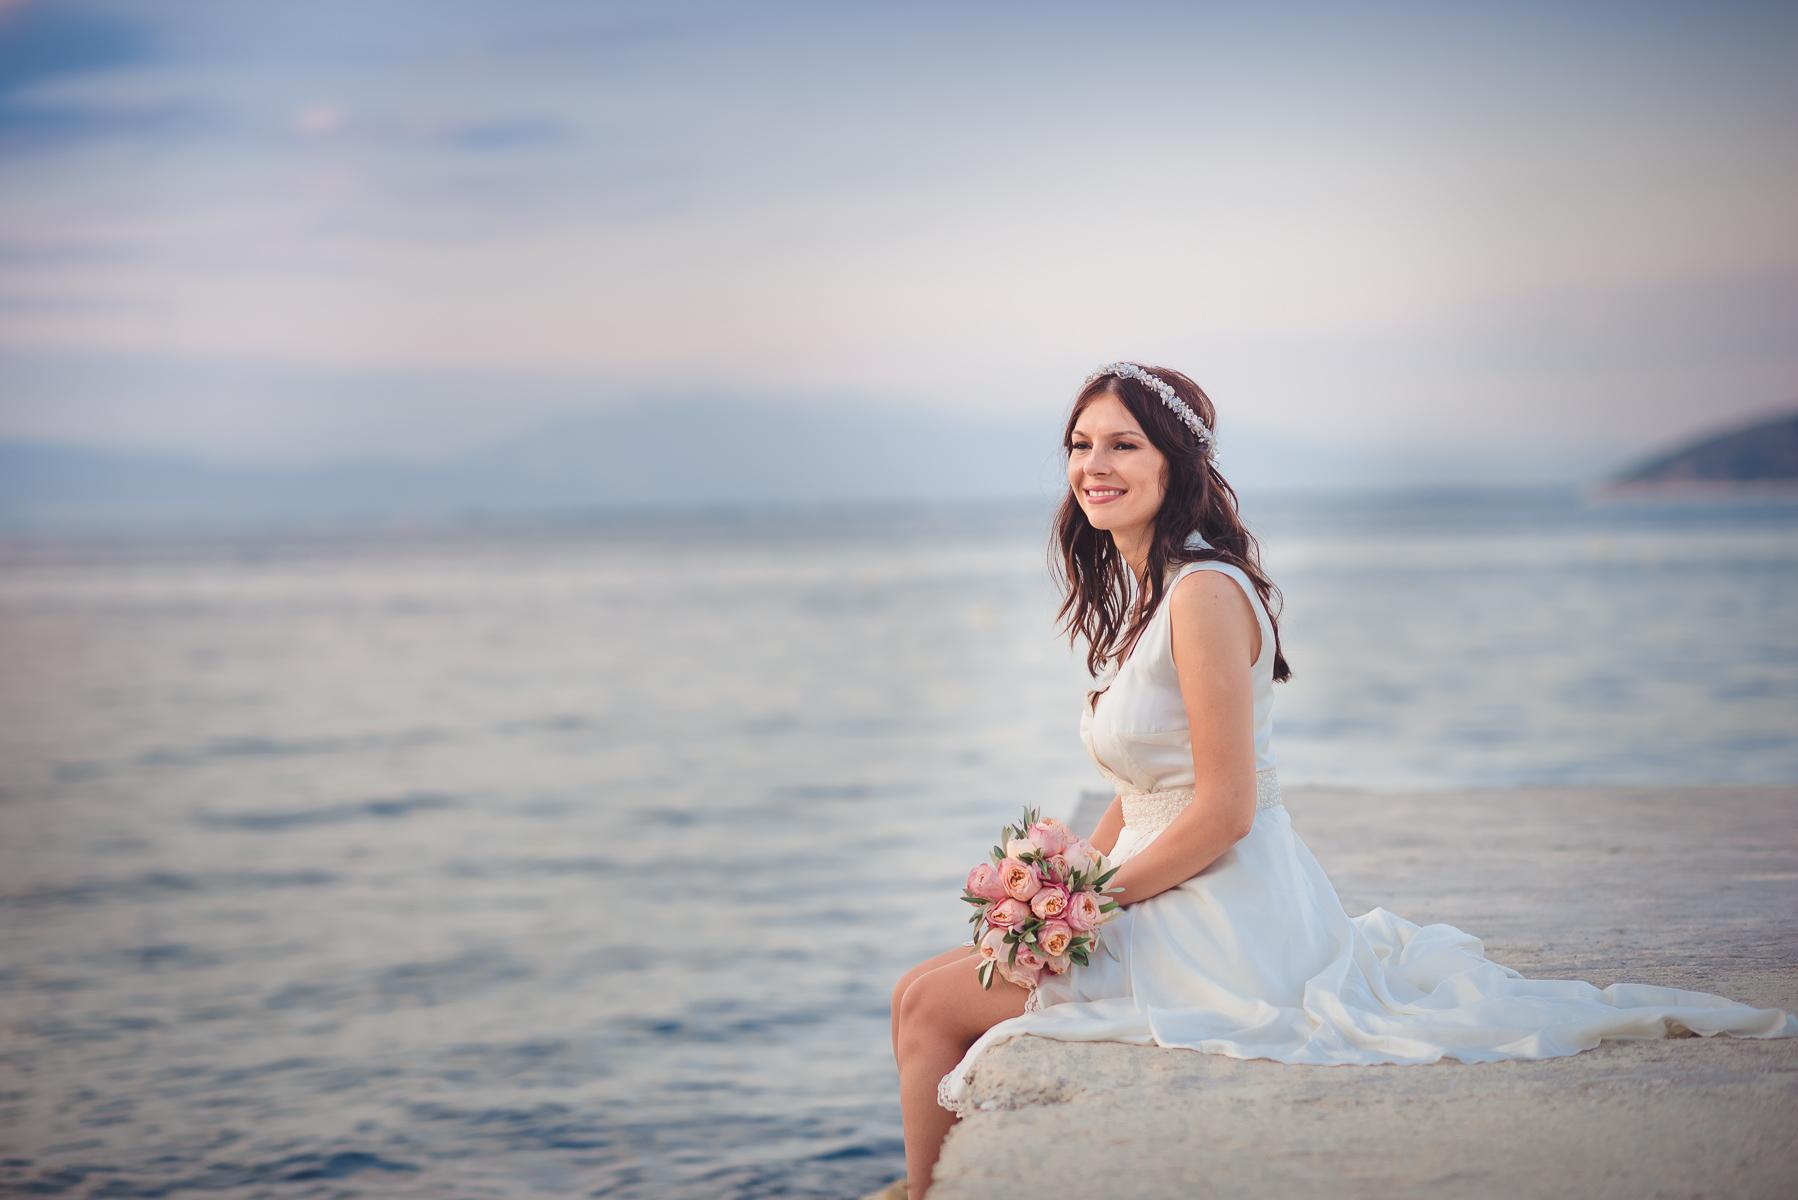 Thassos-greece-wedding-photographer-65